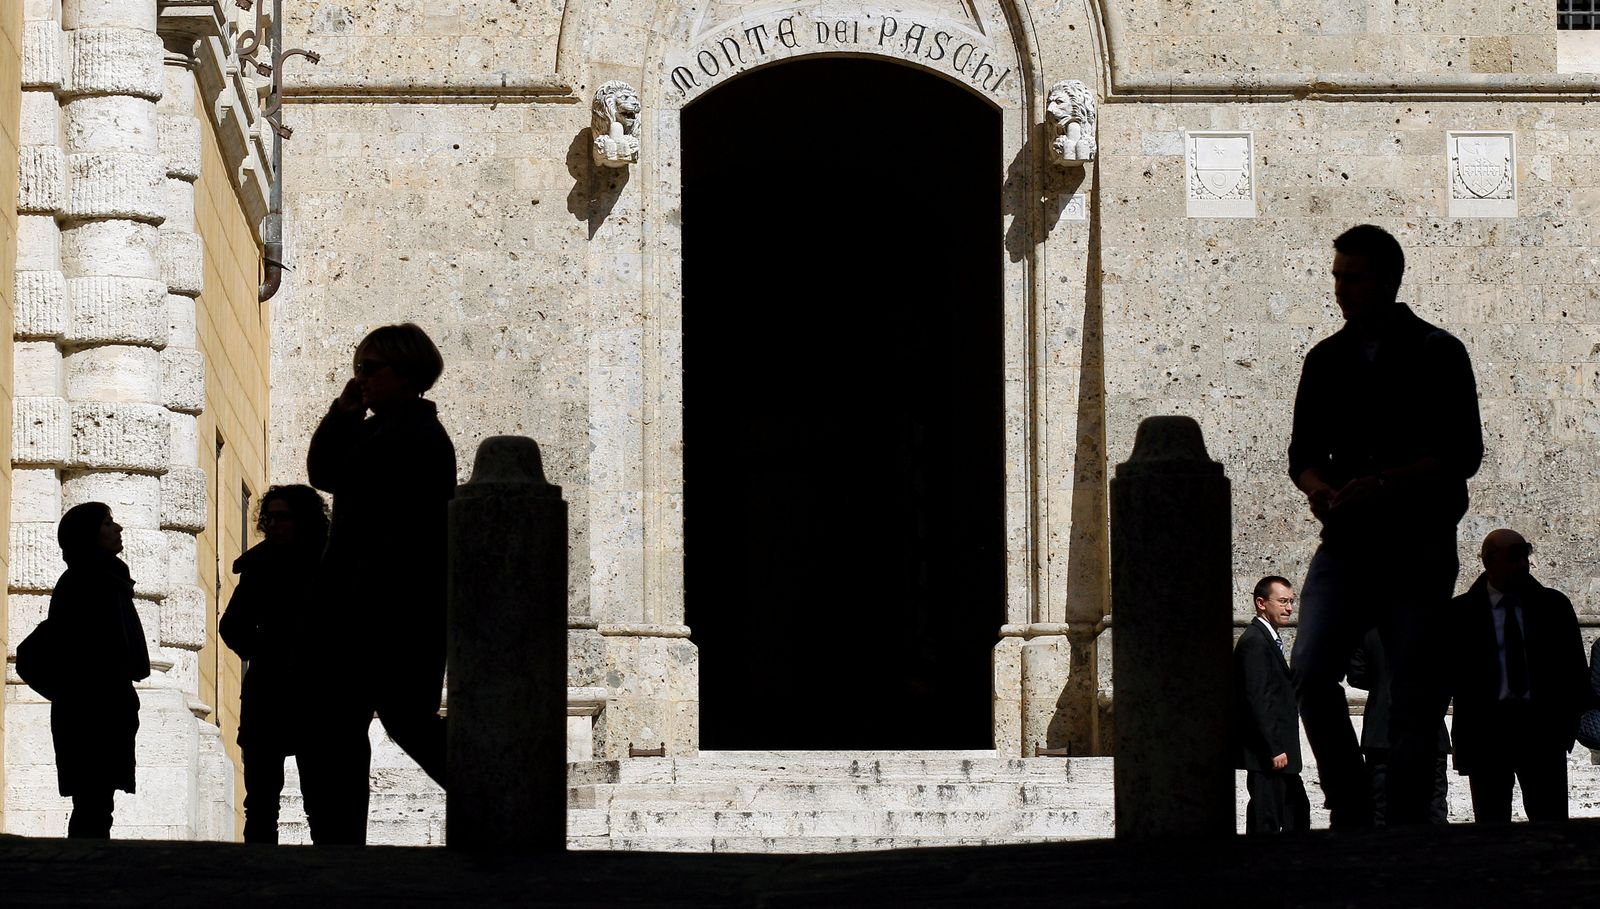 EUROZONE-BANKS/MONTE DEI PASCHI